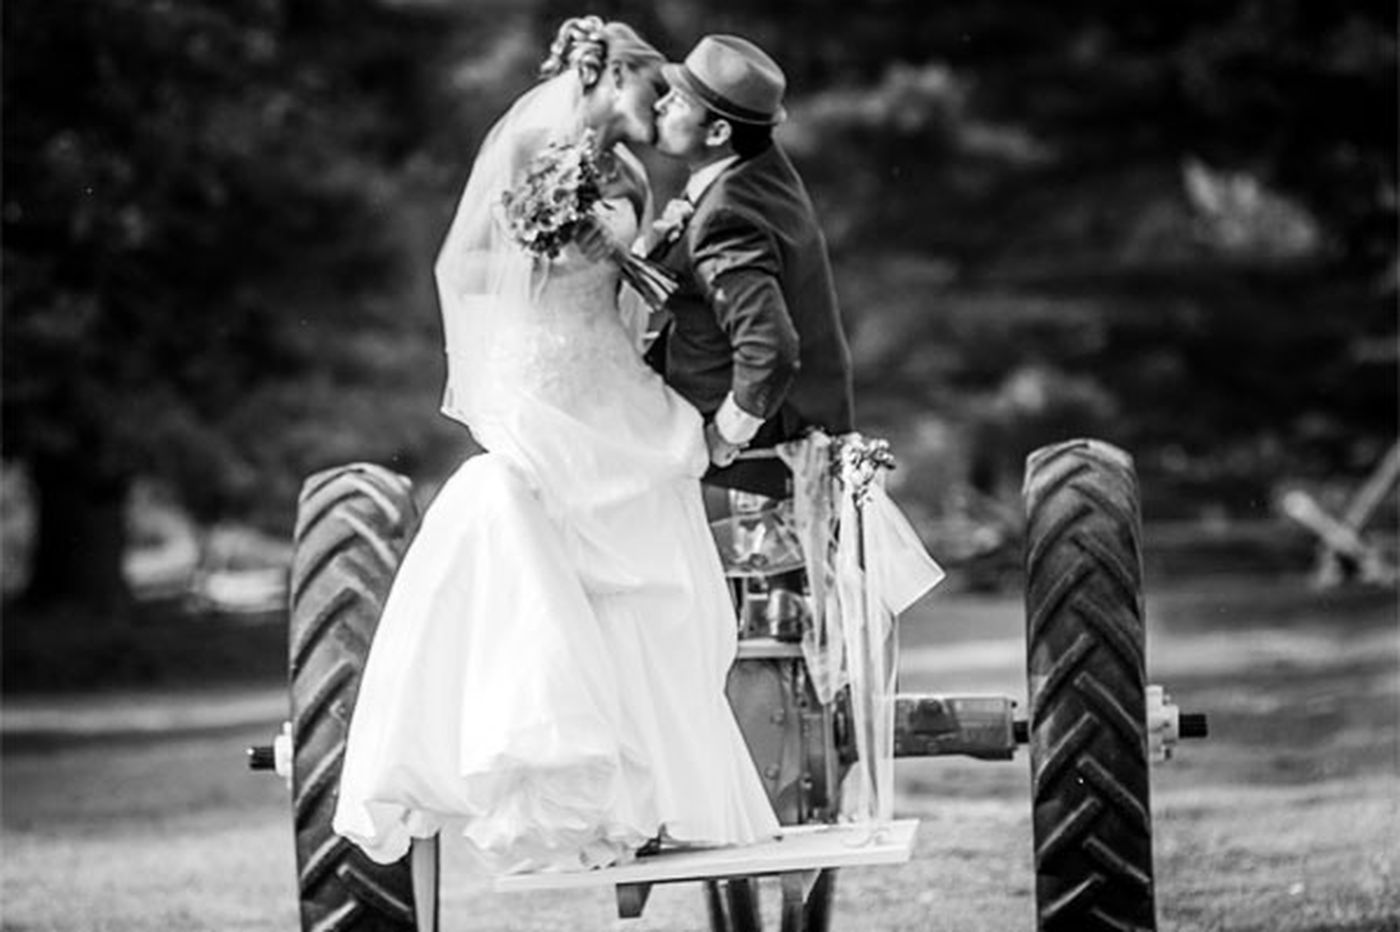 Love: Erika Rymsha & Andrew Rothenberger